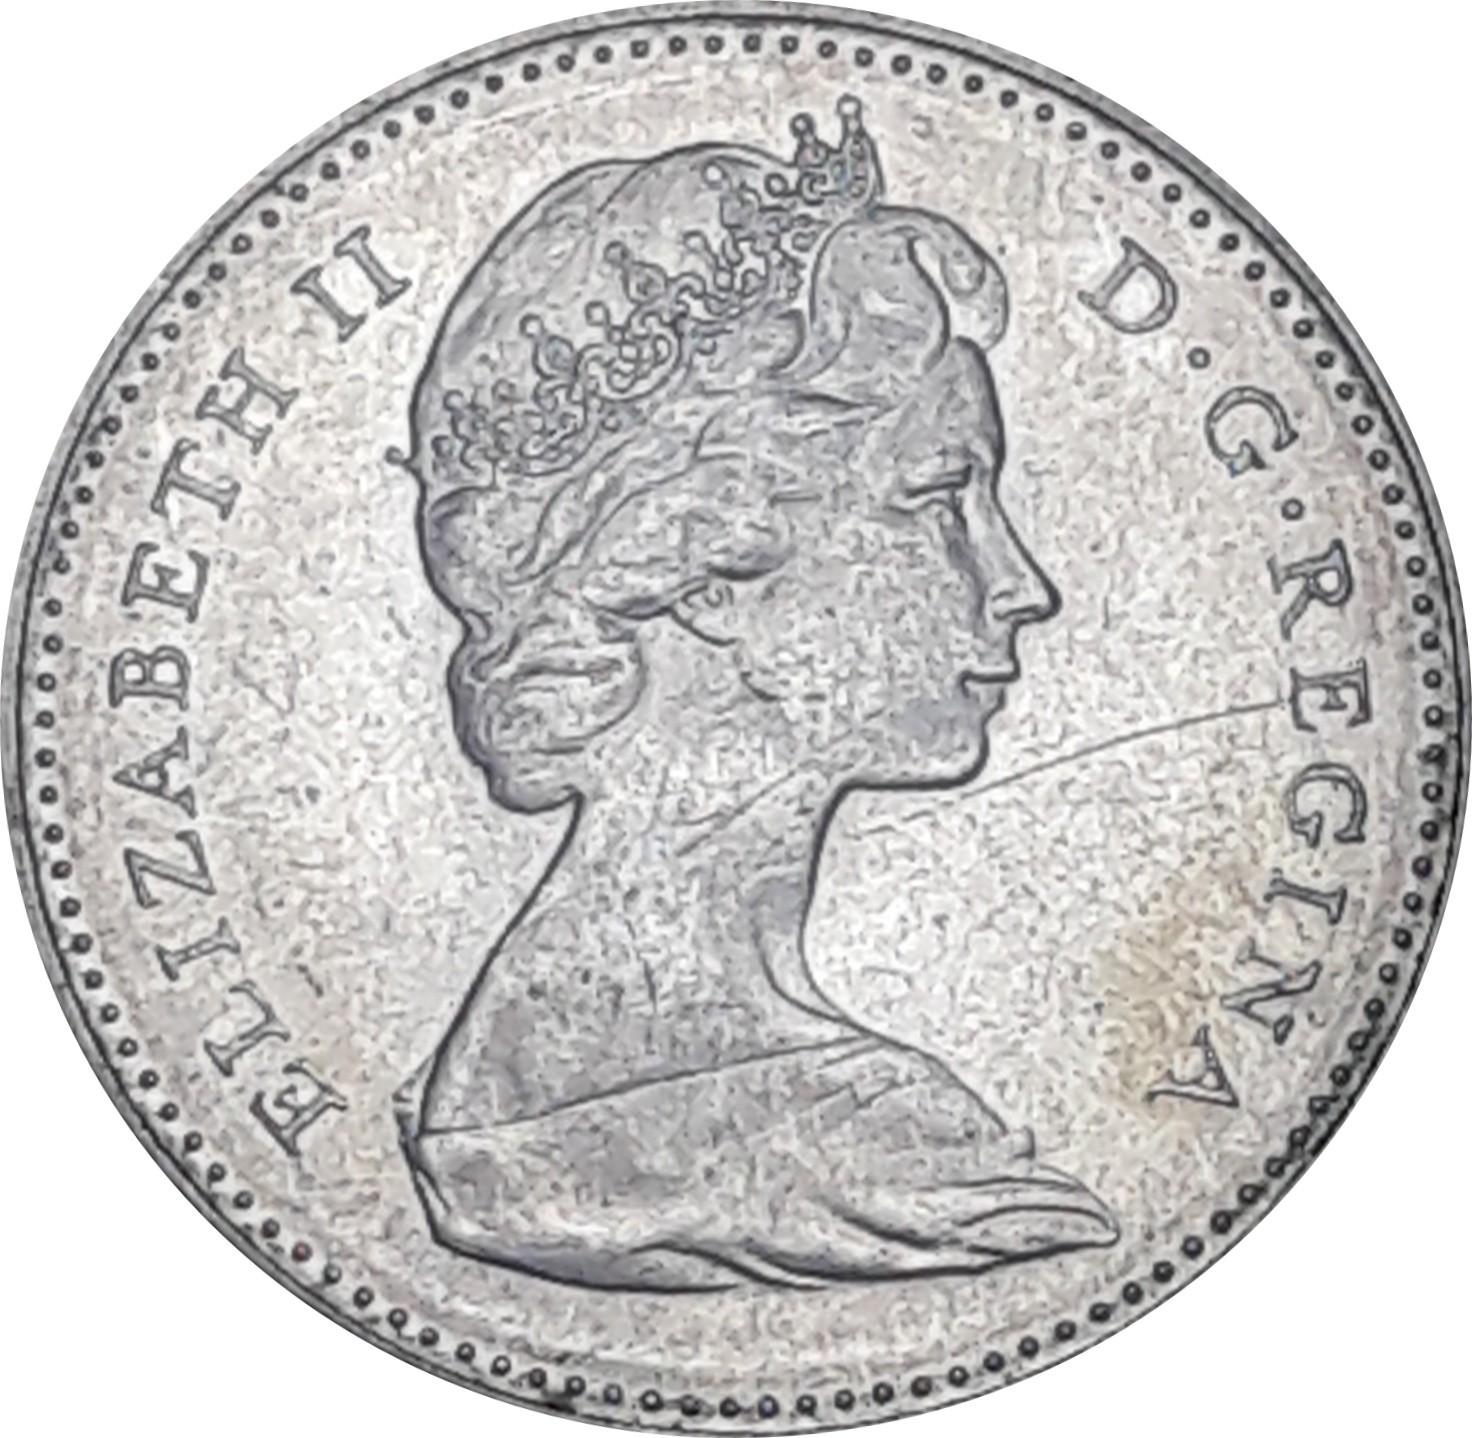 Canada 10 Cents (1967 Elizabeth II)